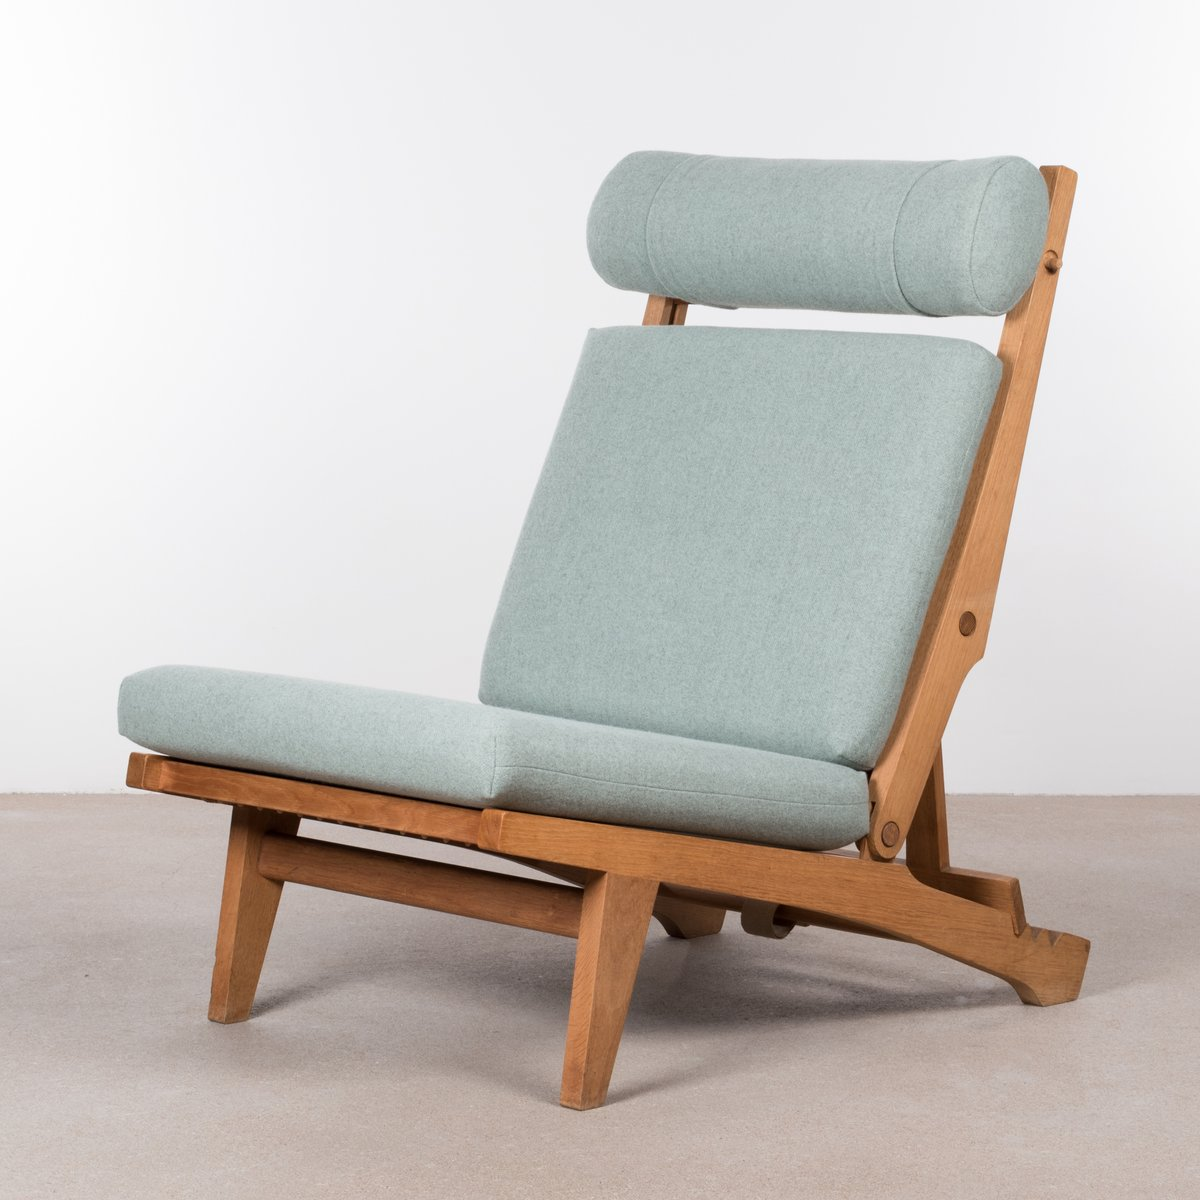 Wegner Sessel dänische vintage modell ap71 sessel von hans wegner für ap stolen